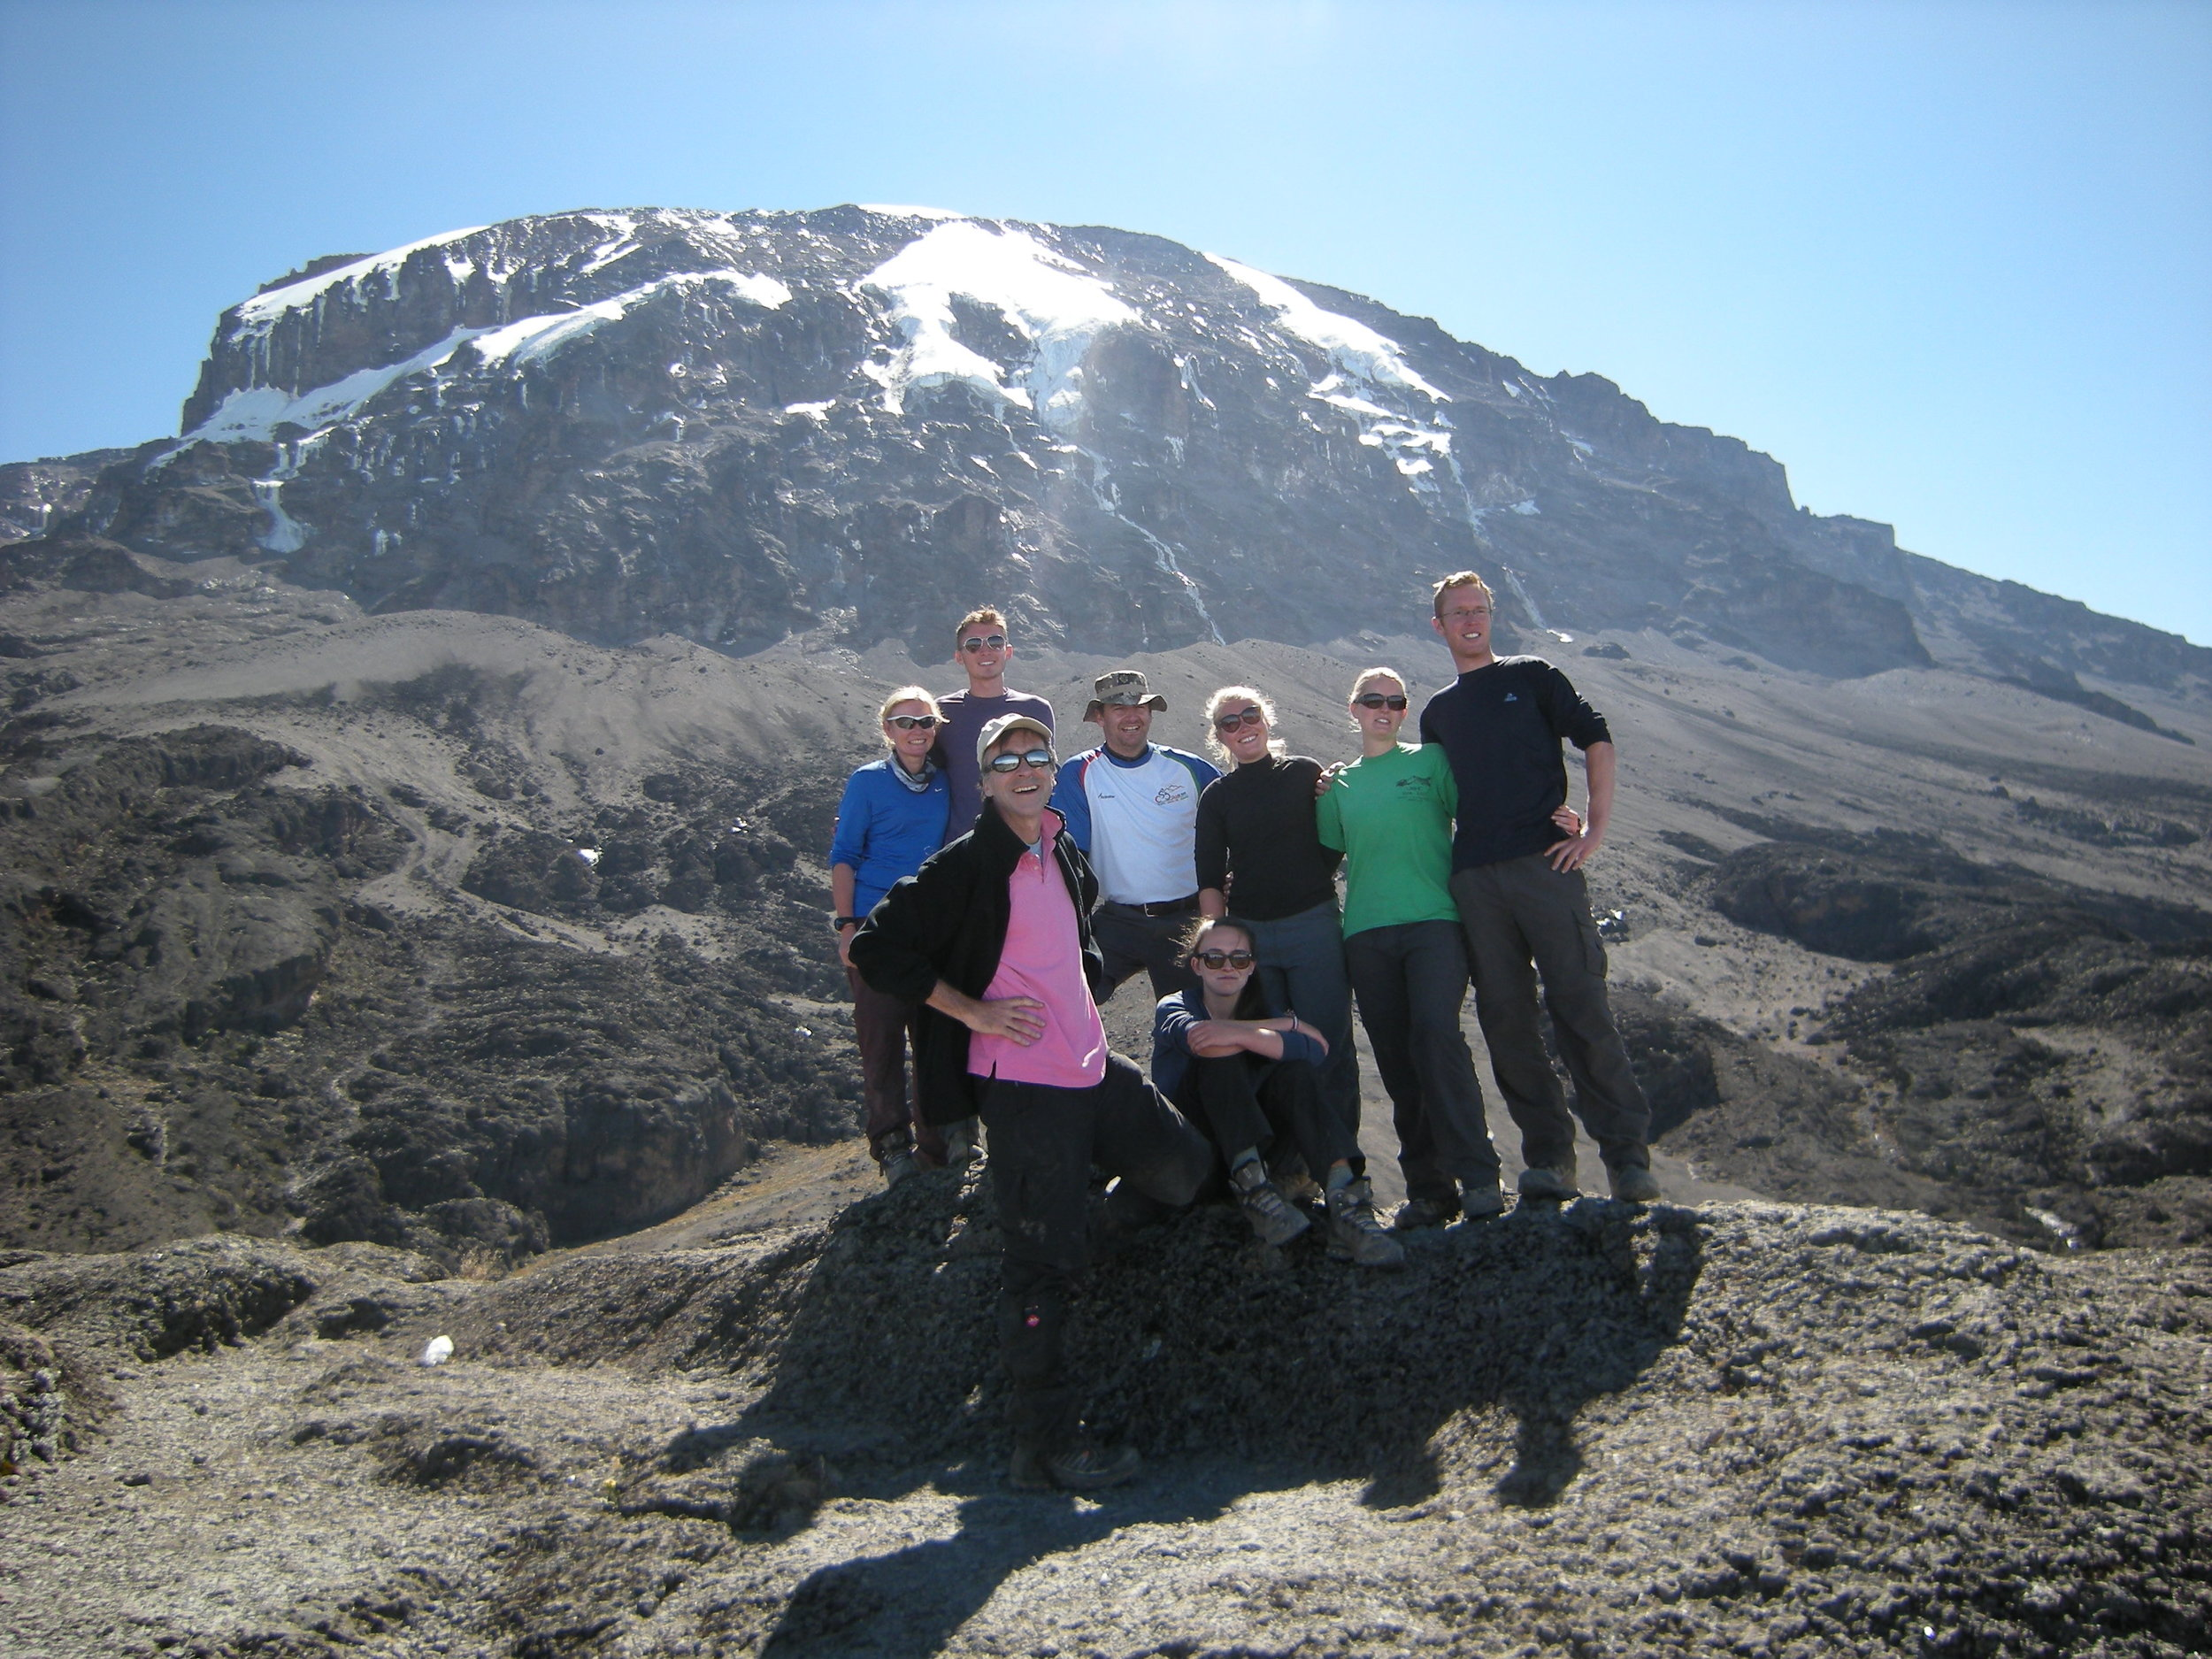 Climbing Kilimanjaro for Livingstone Tanzania Trust